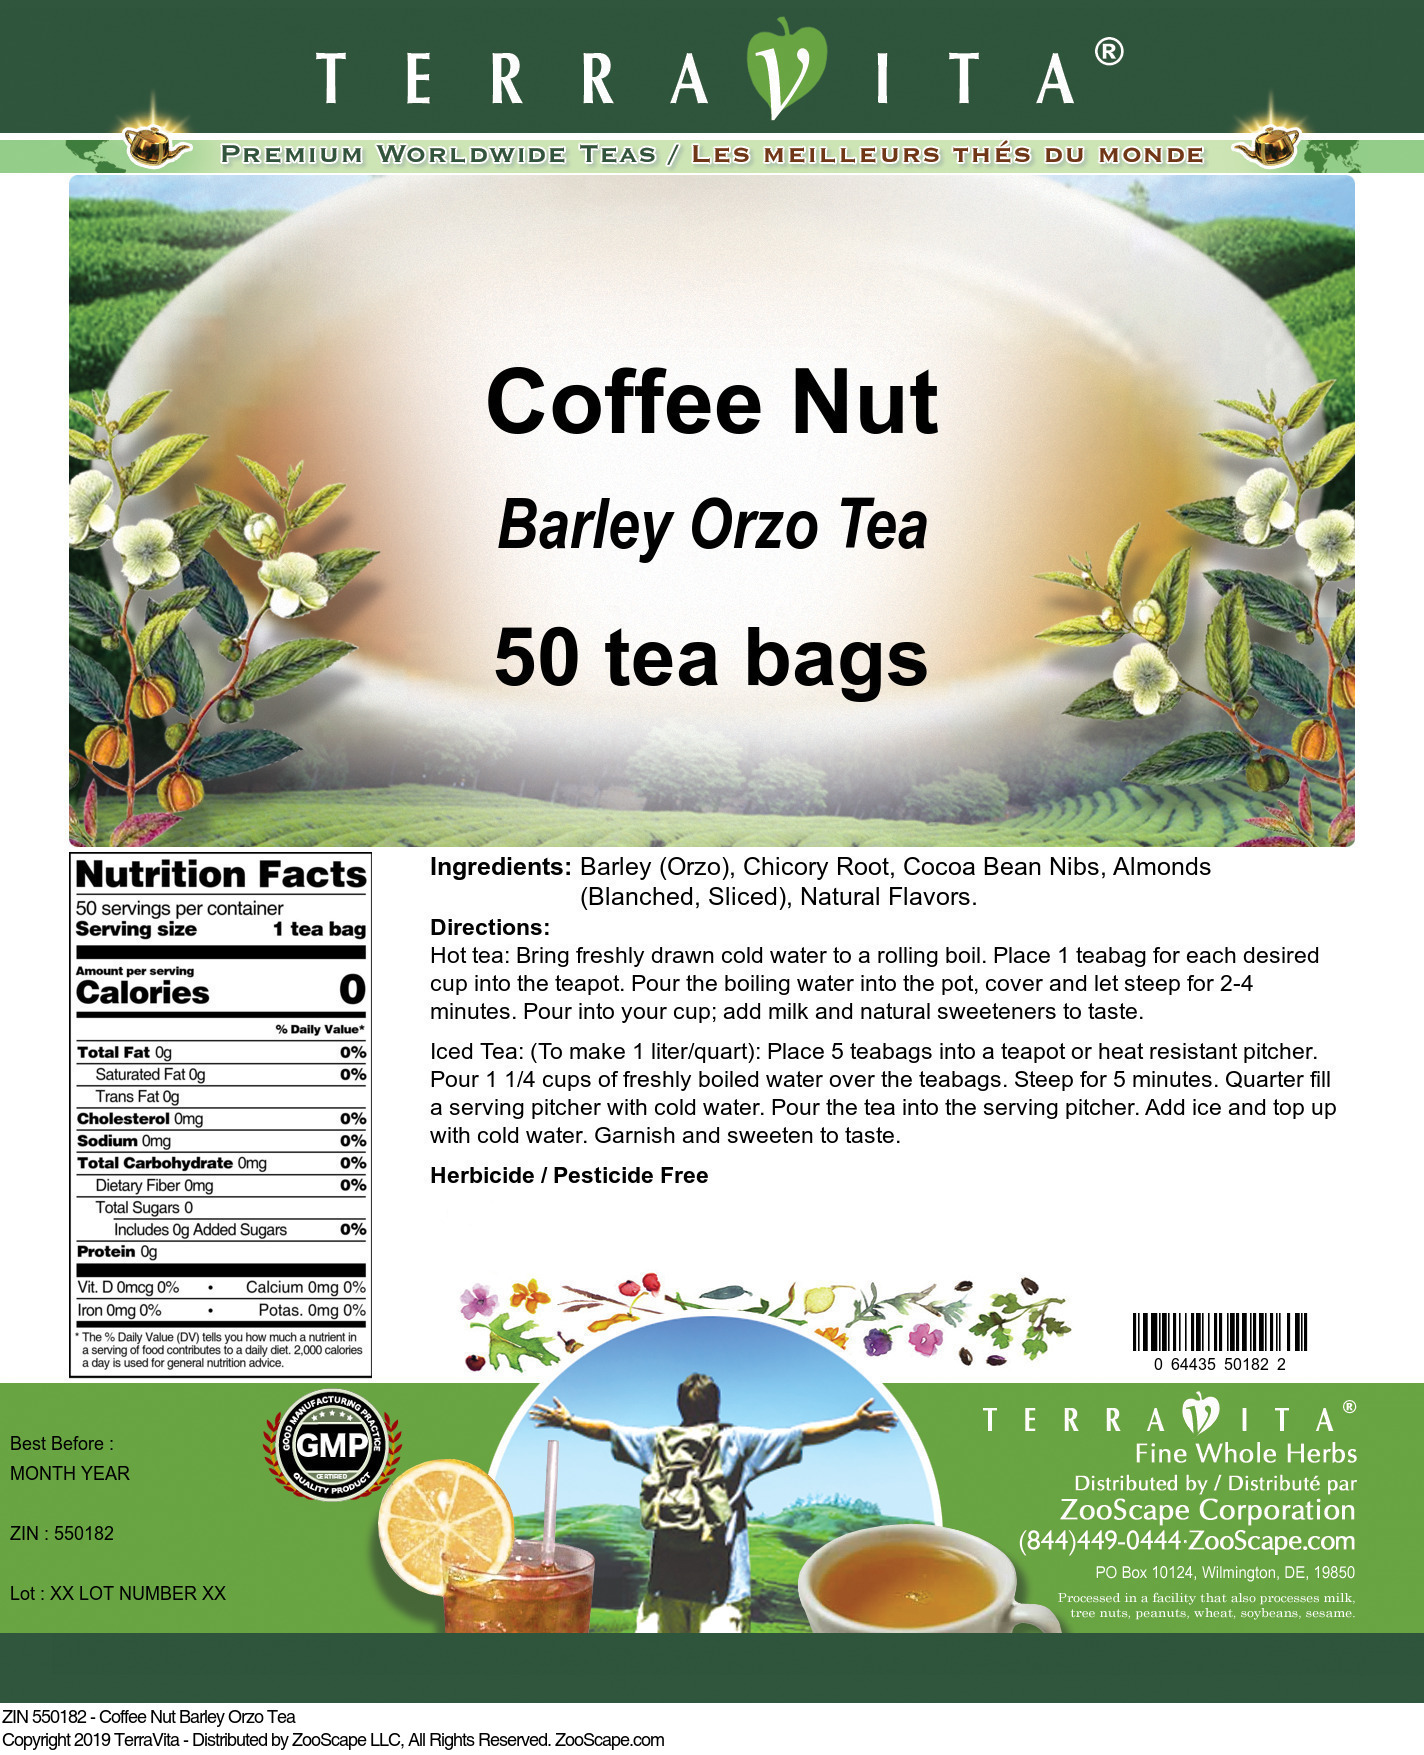 Coffee Nut Barley Orzo